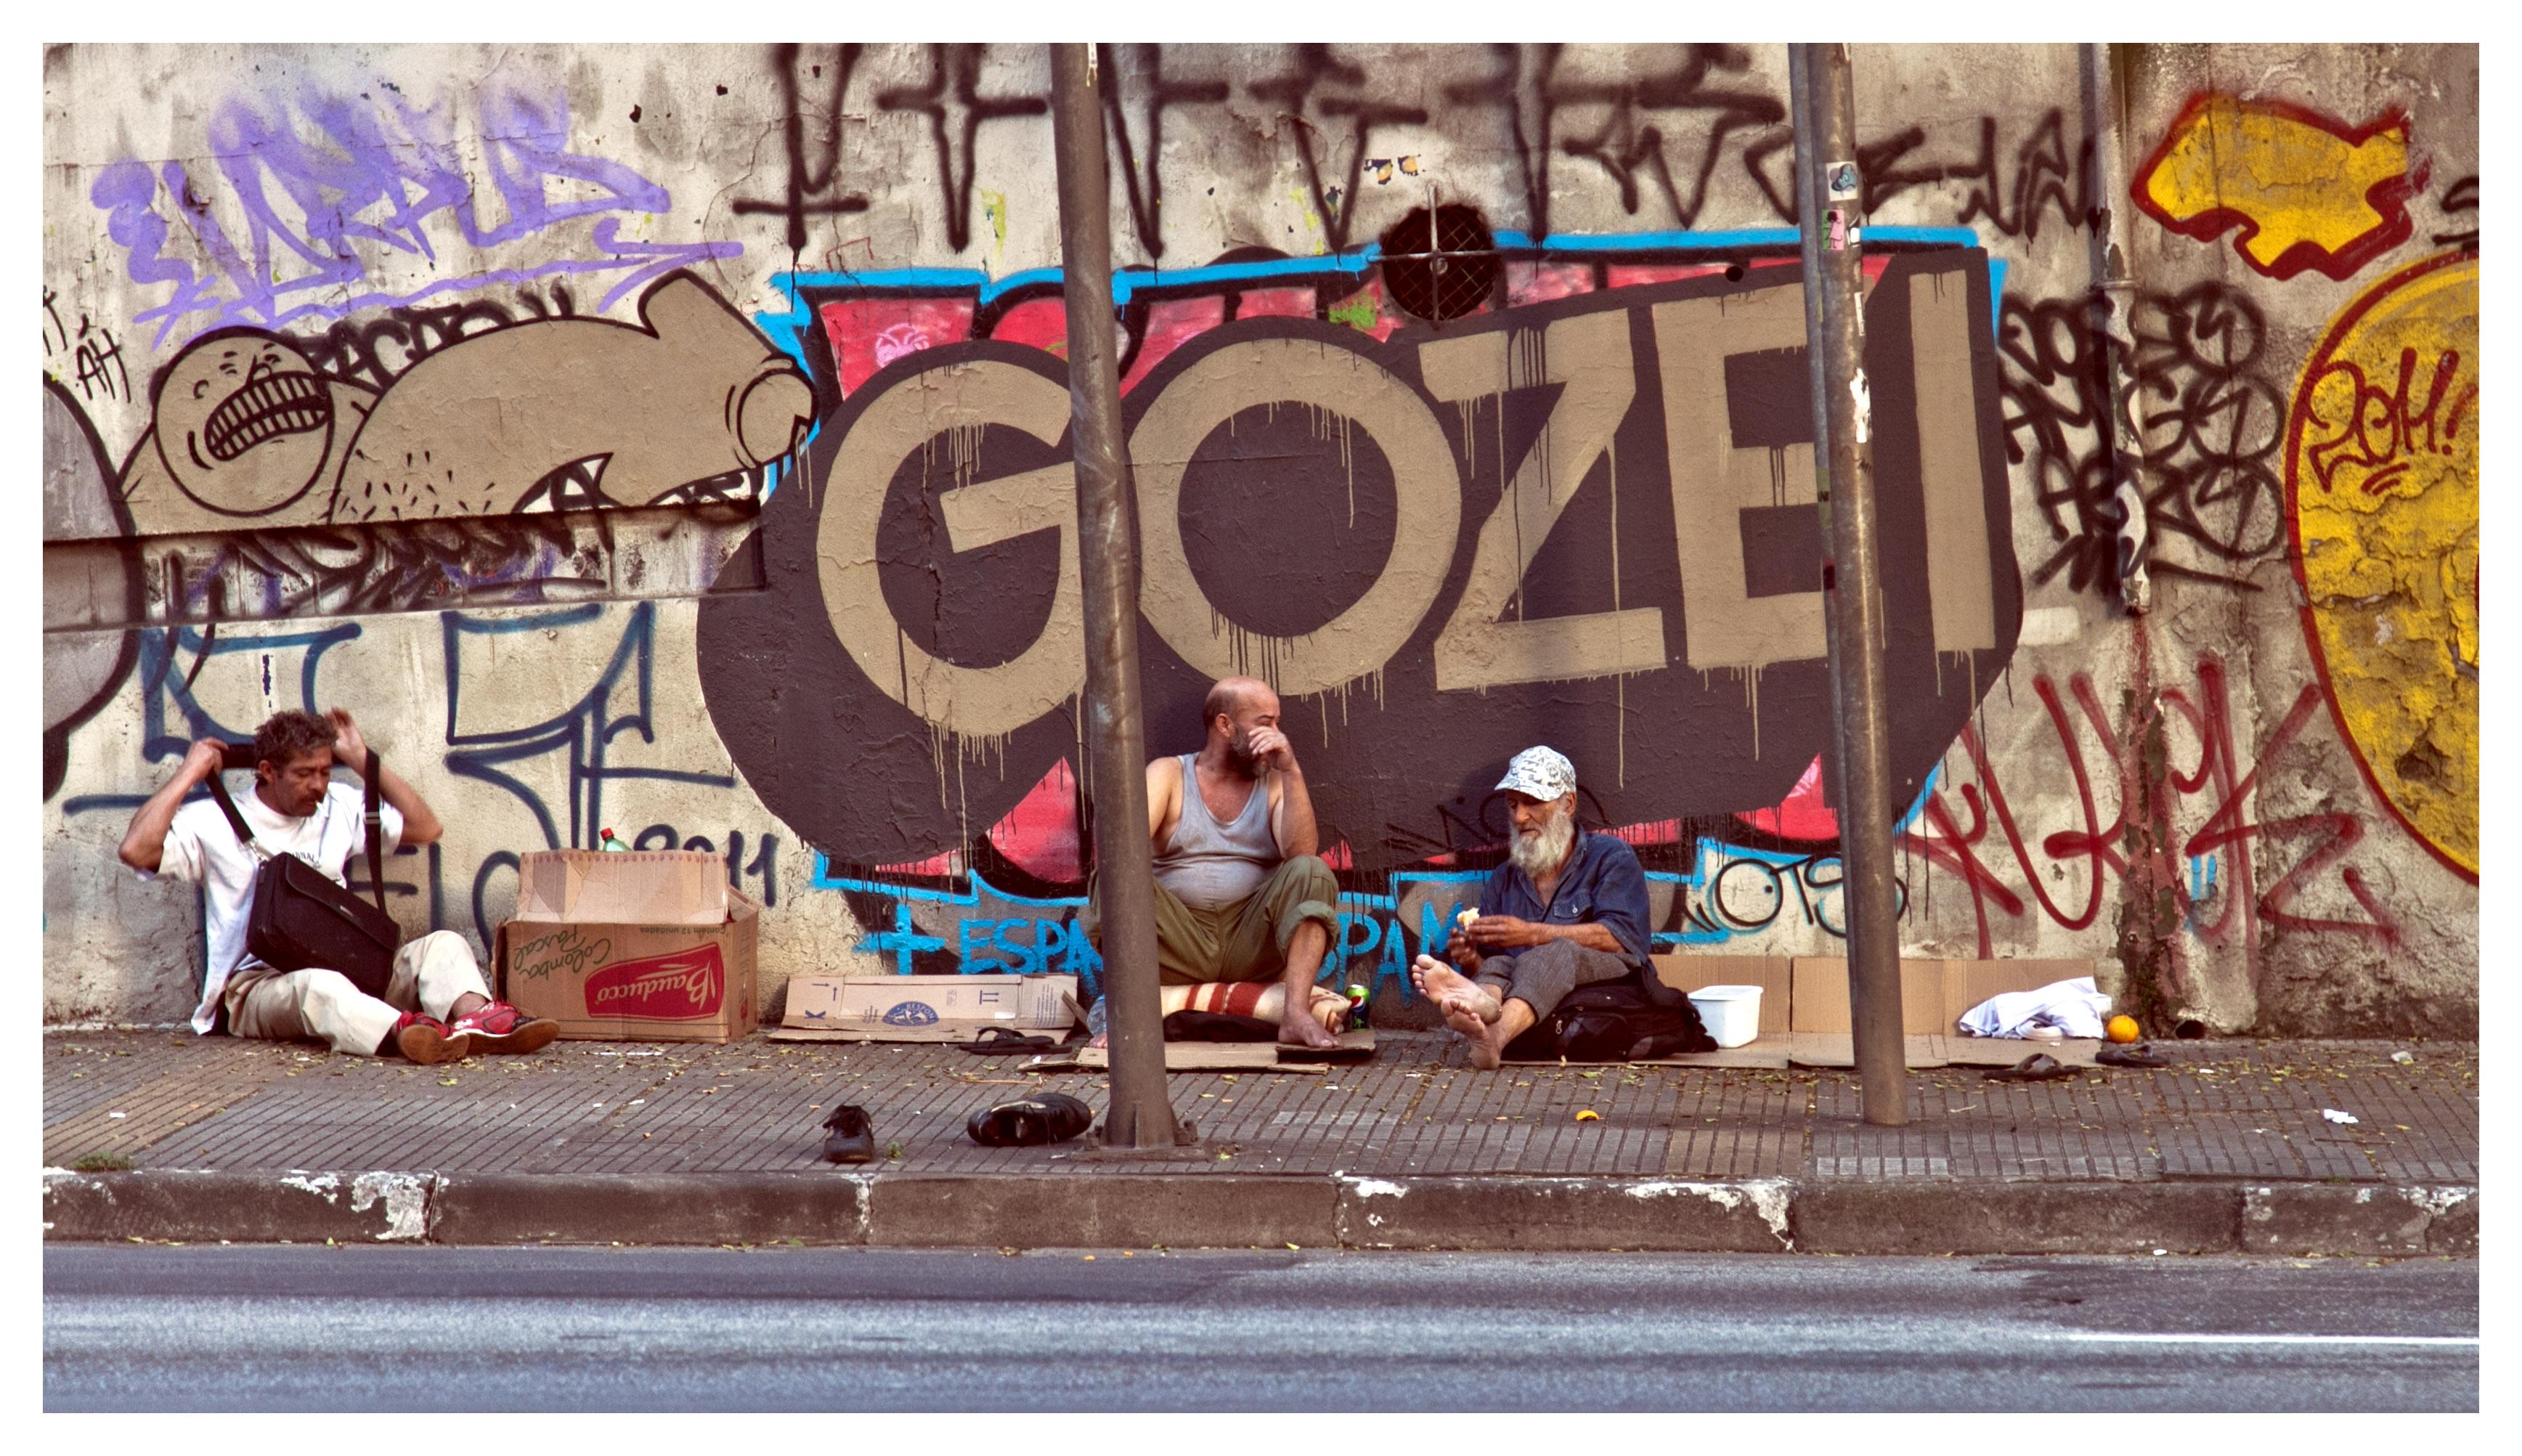 street gozei